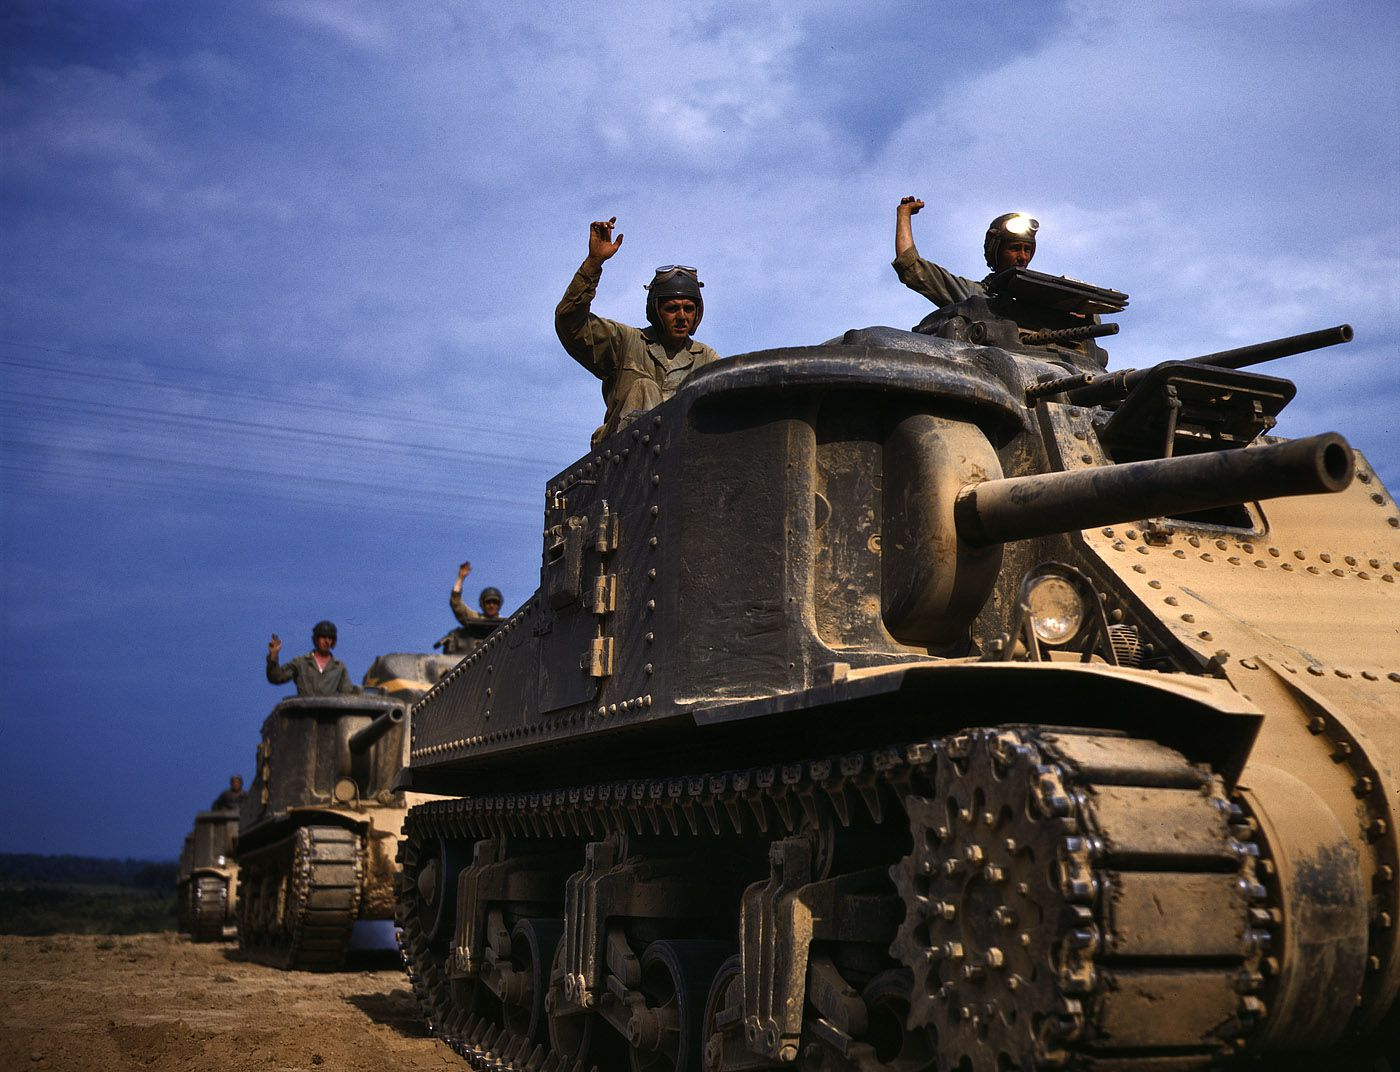 propagande usa guerre mondiale kodachrome 23 - Juin 1942 : Equipages de chars M3 à Fort Knox, Kentucky